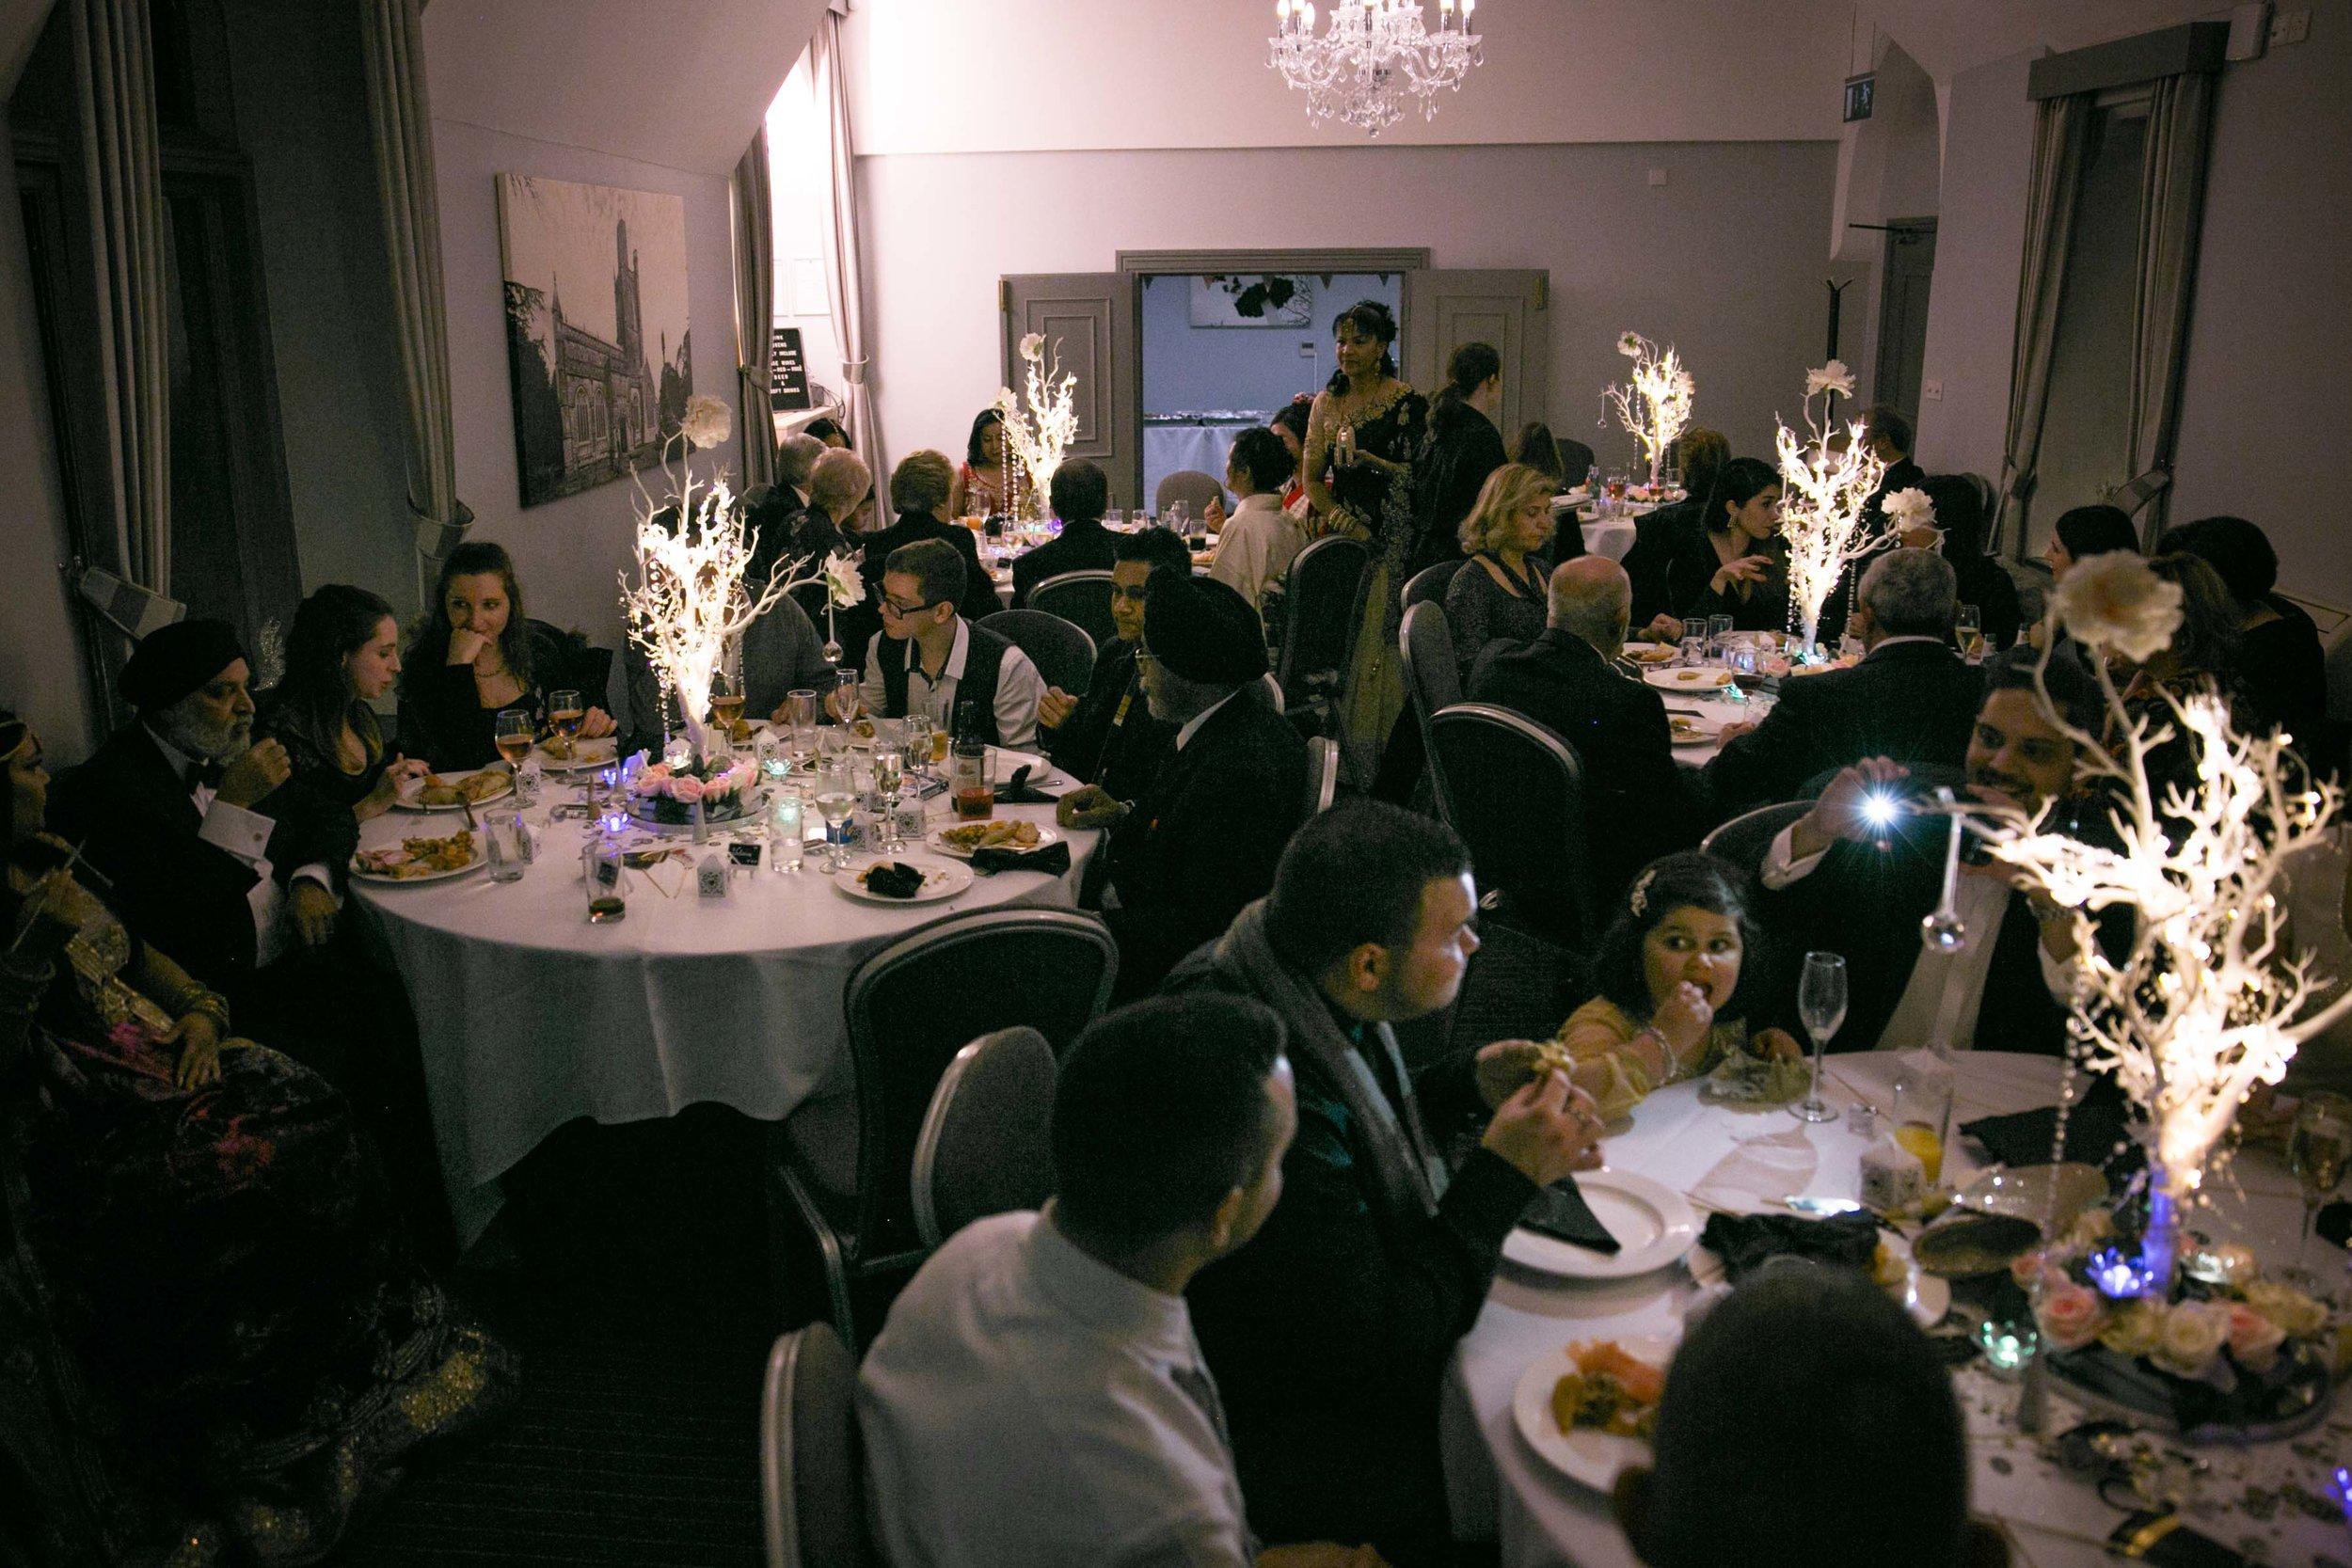 hilton-double-tree-cadbury-house-surprise-birthday-party-photography-natalia-smith-photography-16.jpg